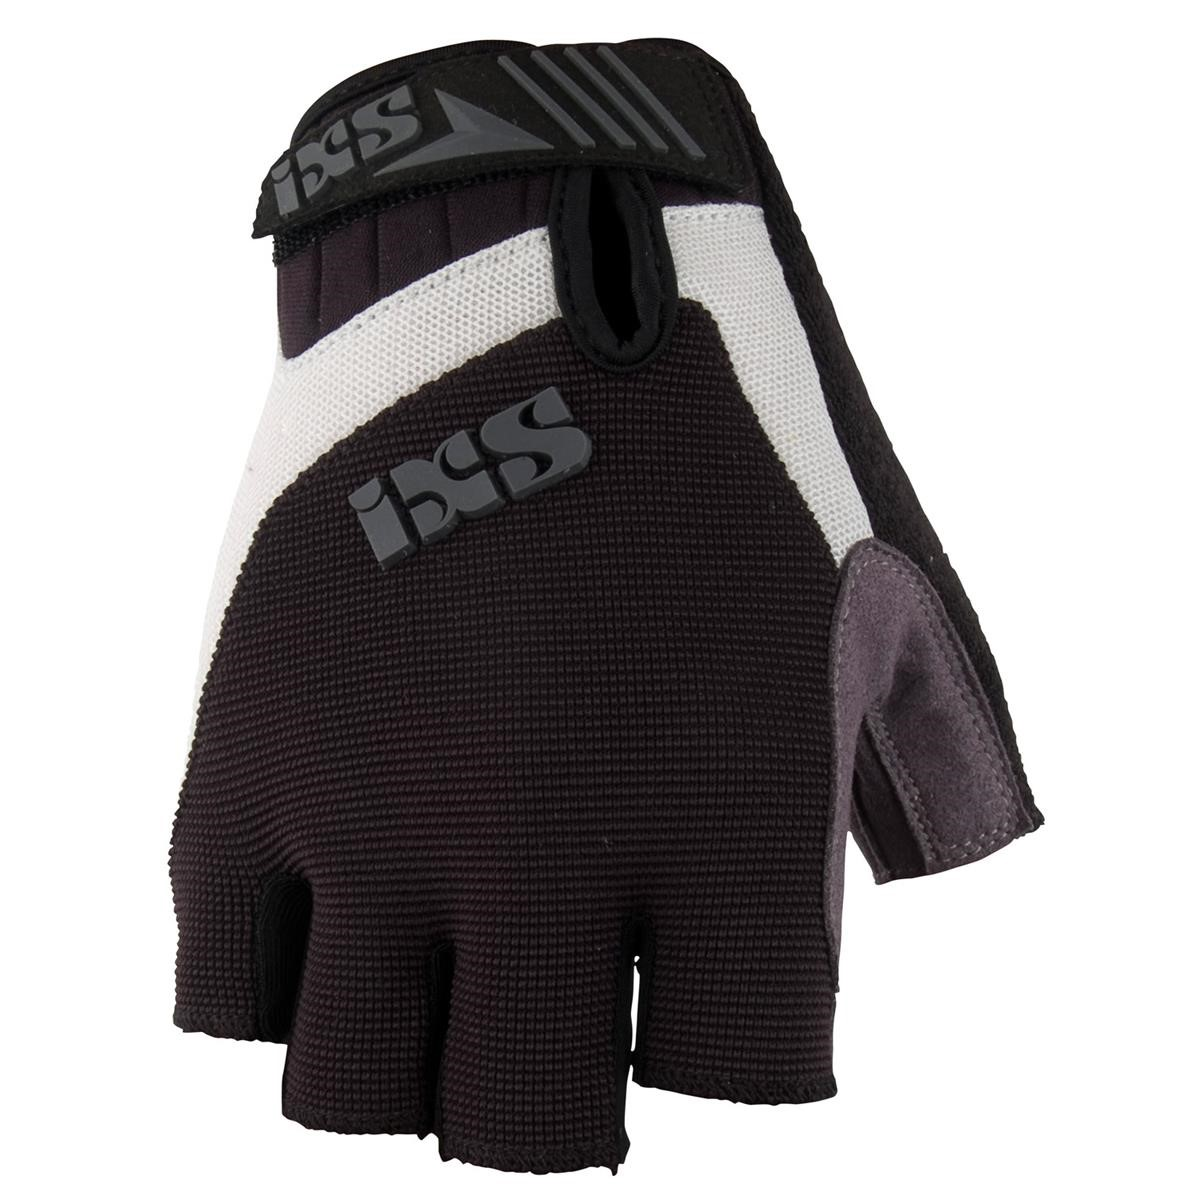 IXS Kurzfinger-Handschuhe XC-X1, XL, Schwarz